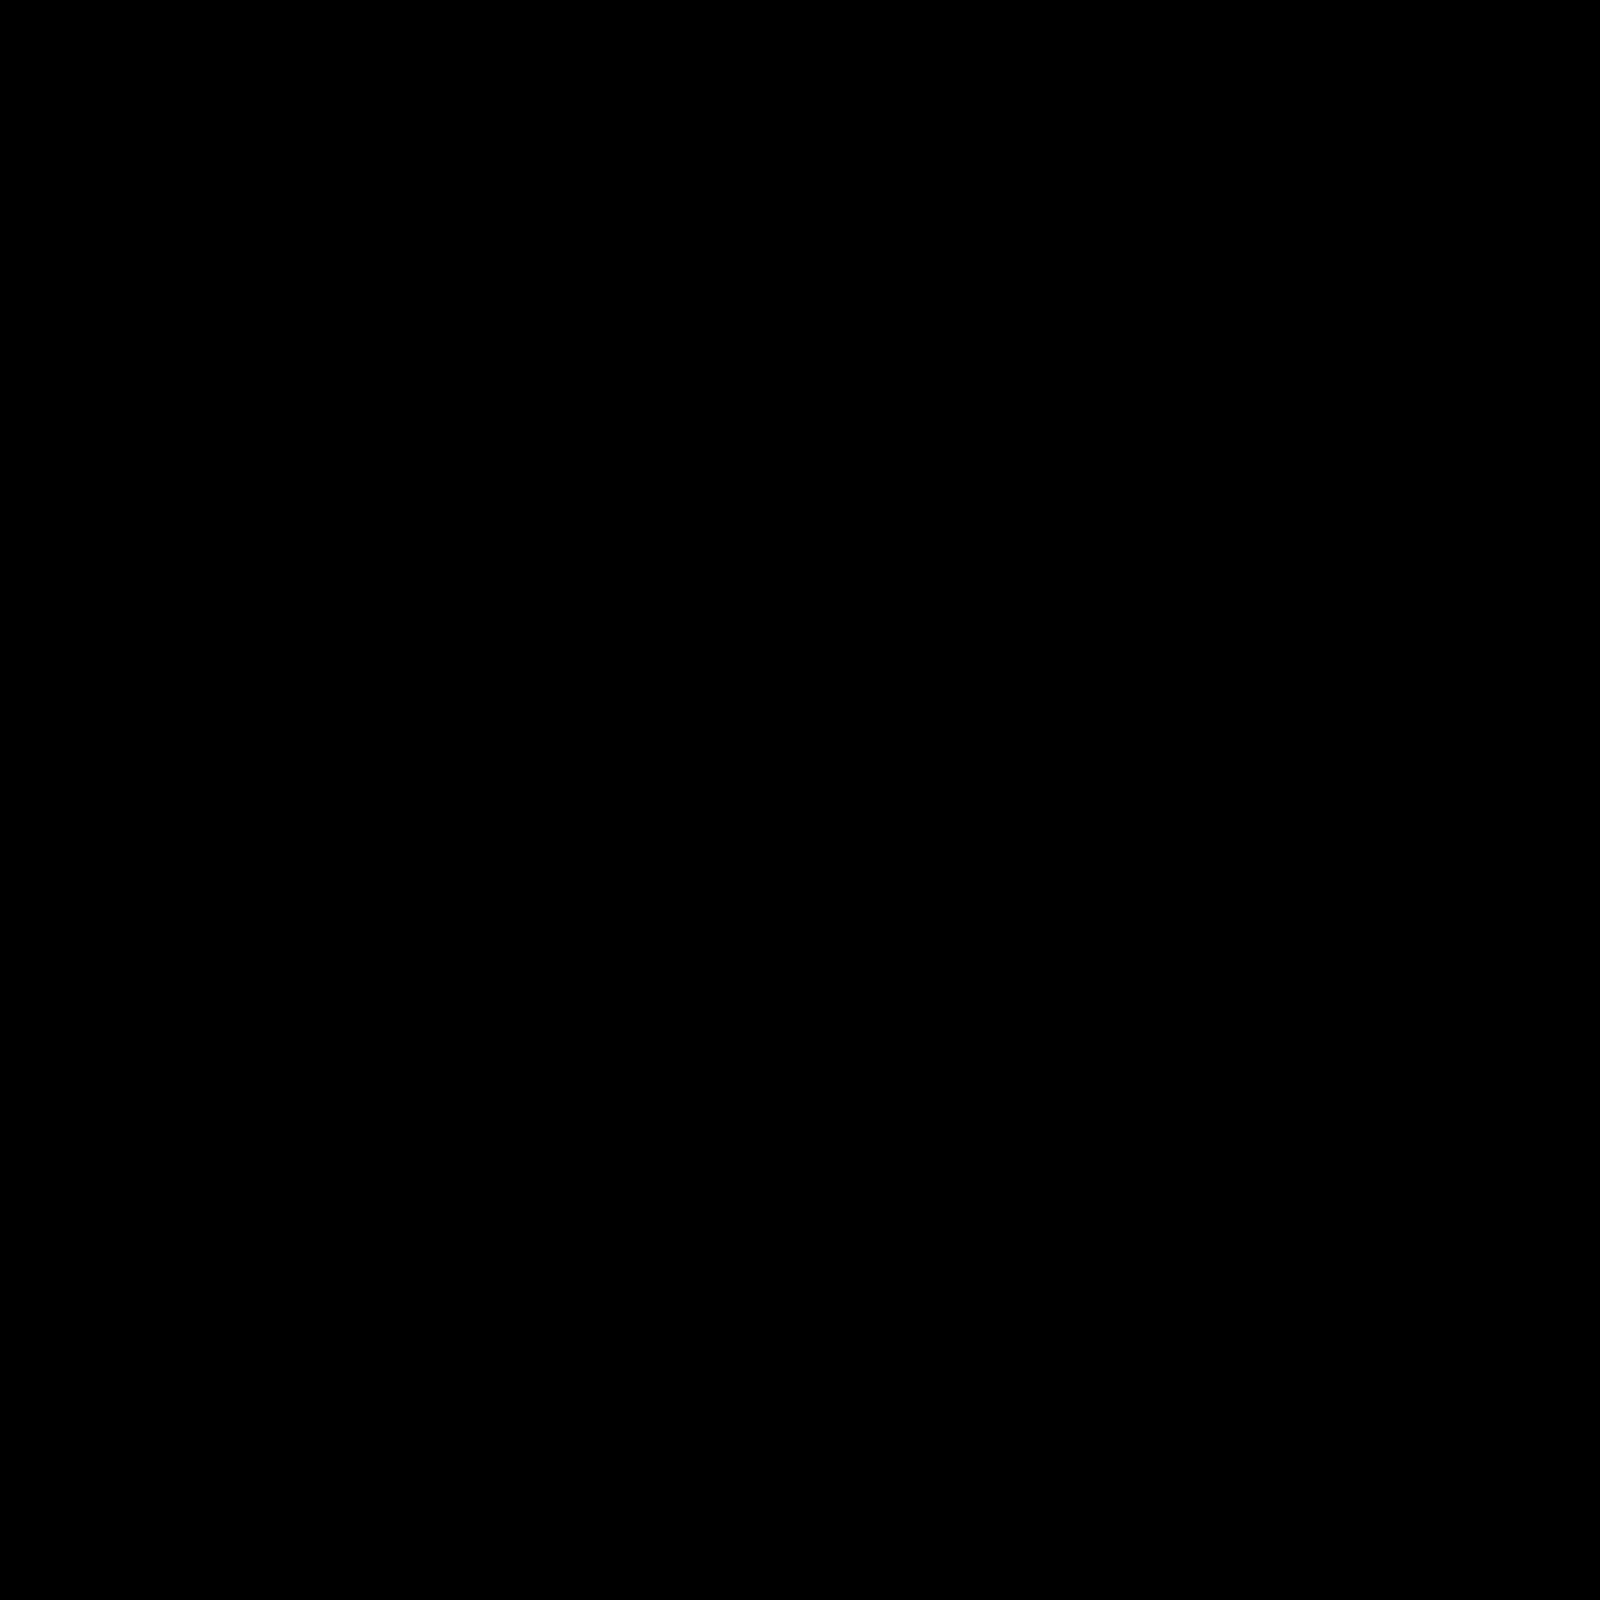 Конфигурация данных icon